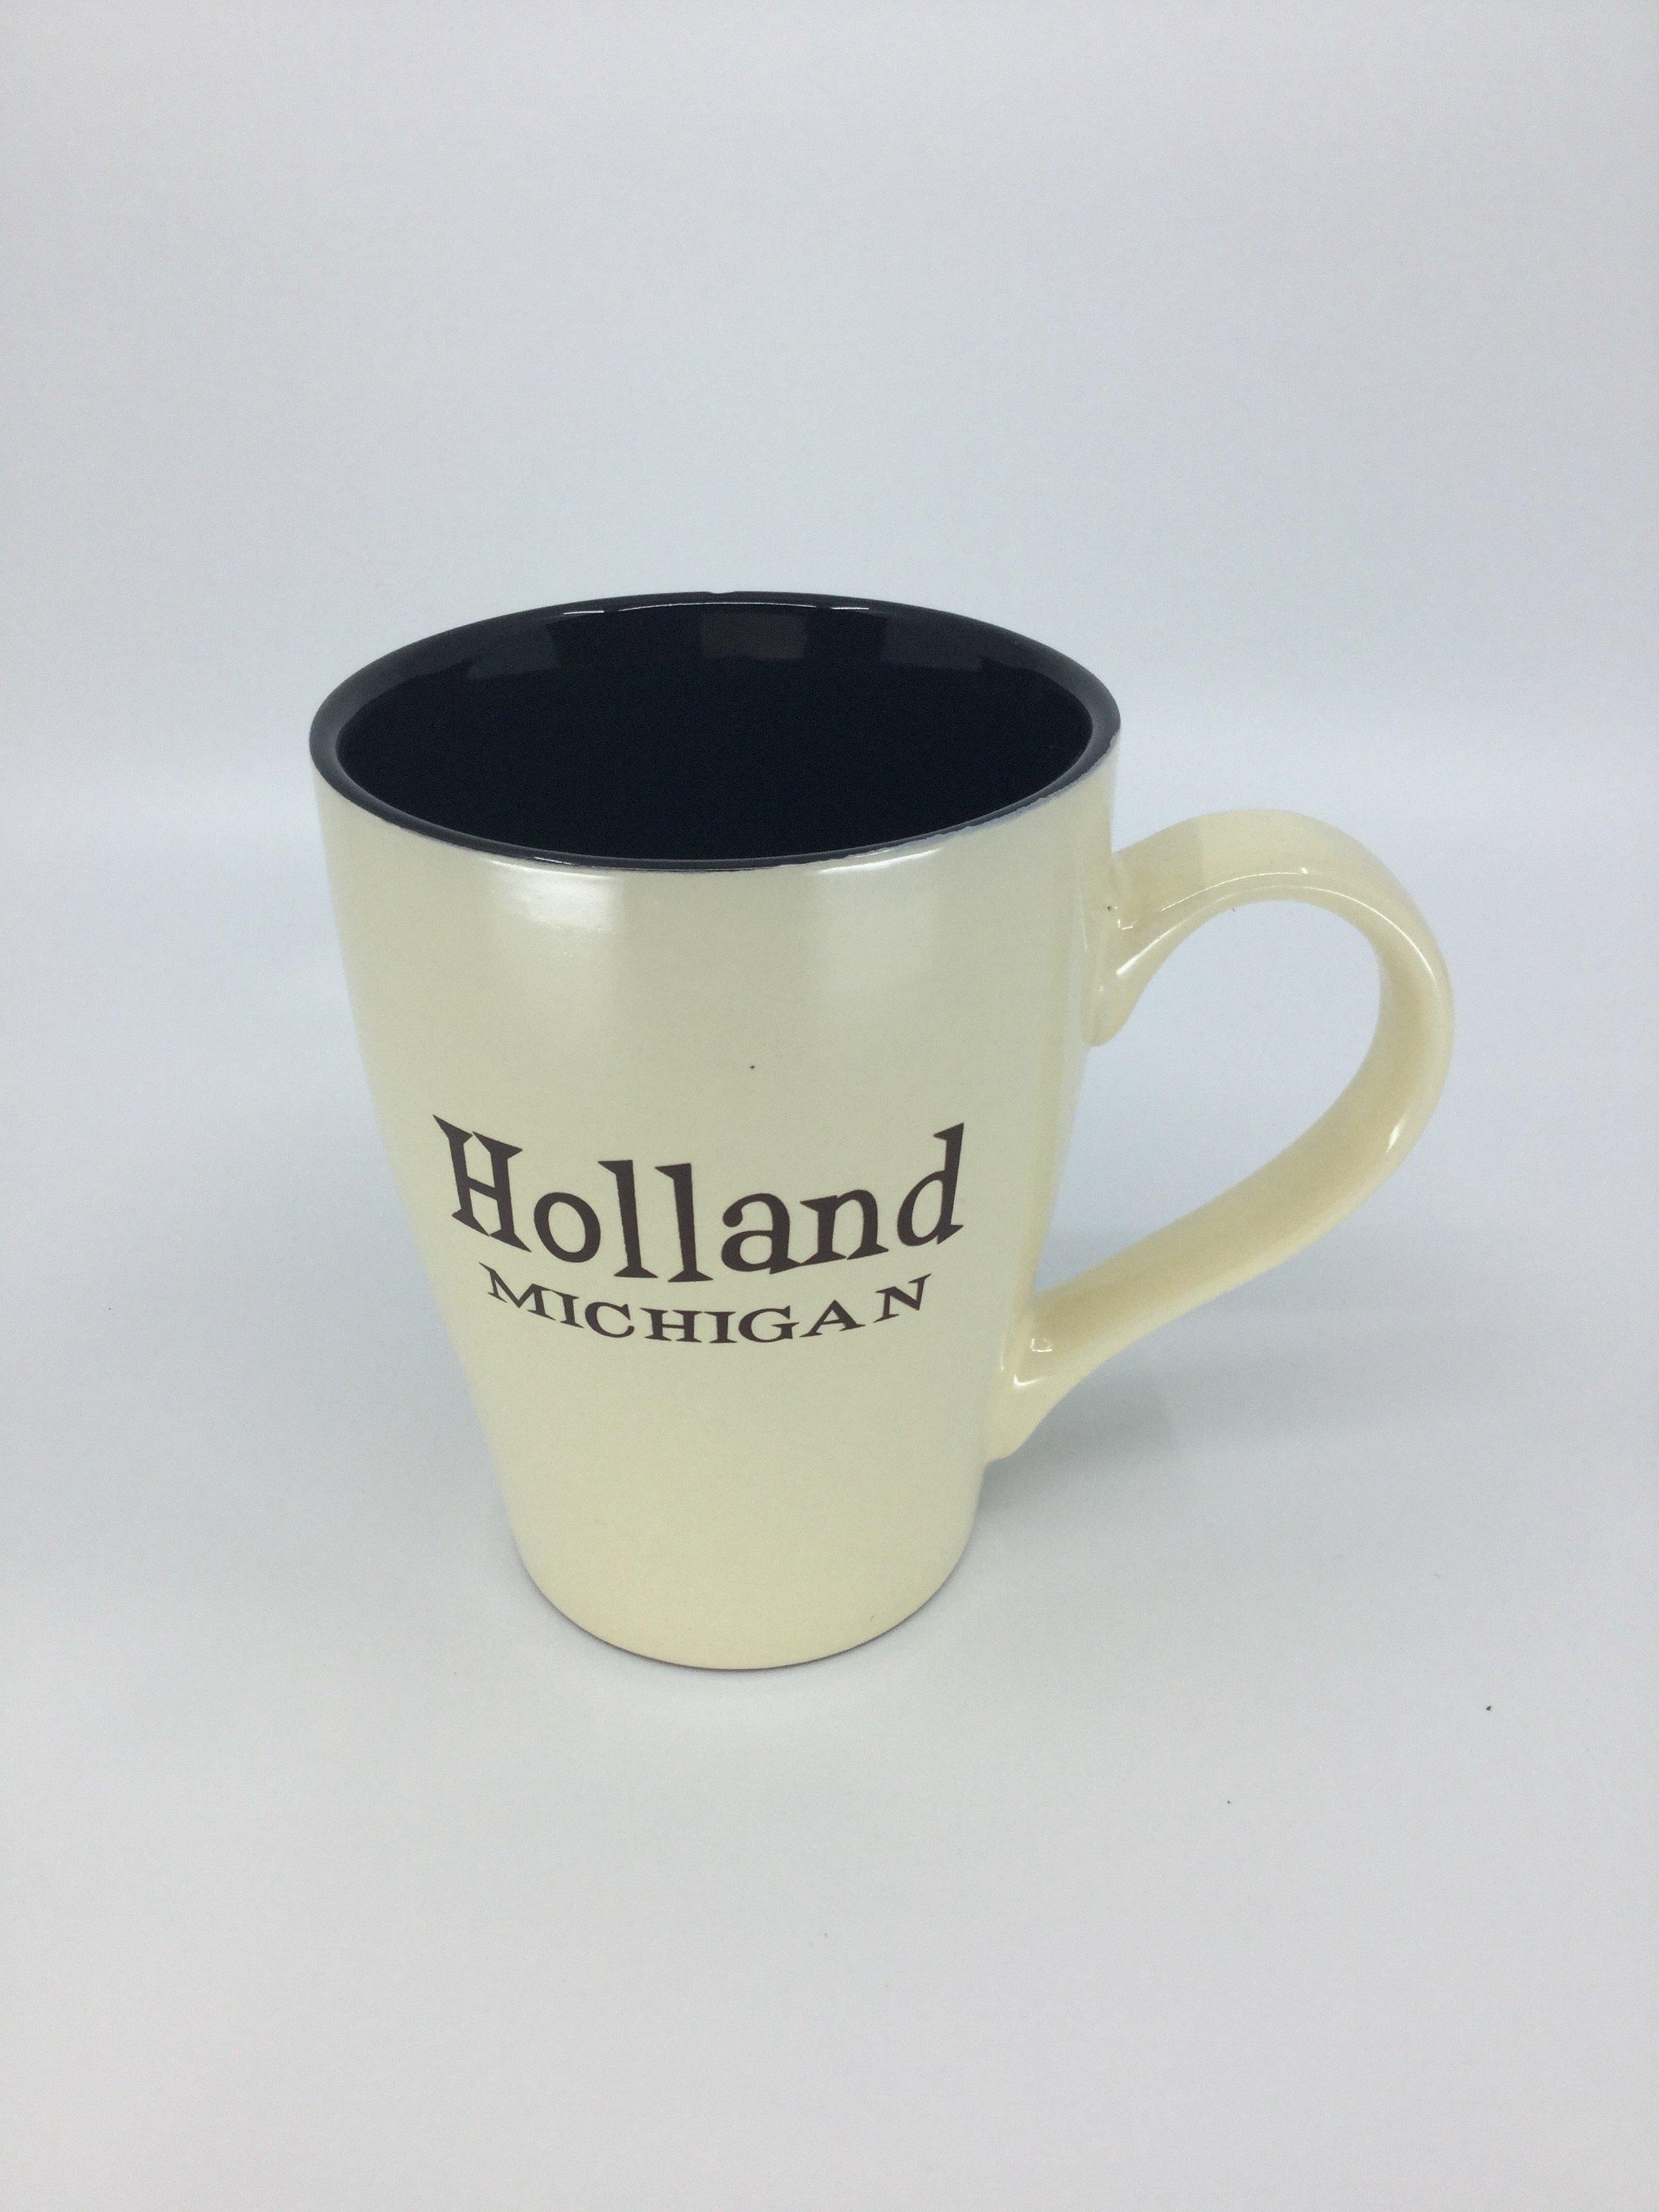 MUG HOLLAND BEIGE